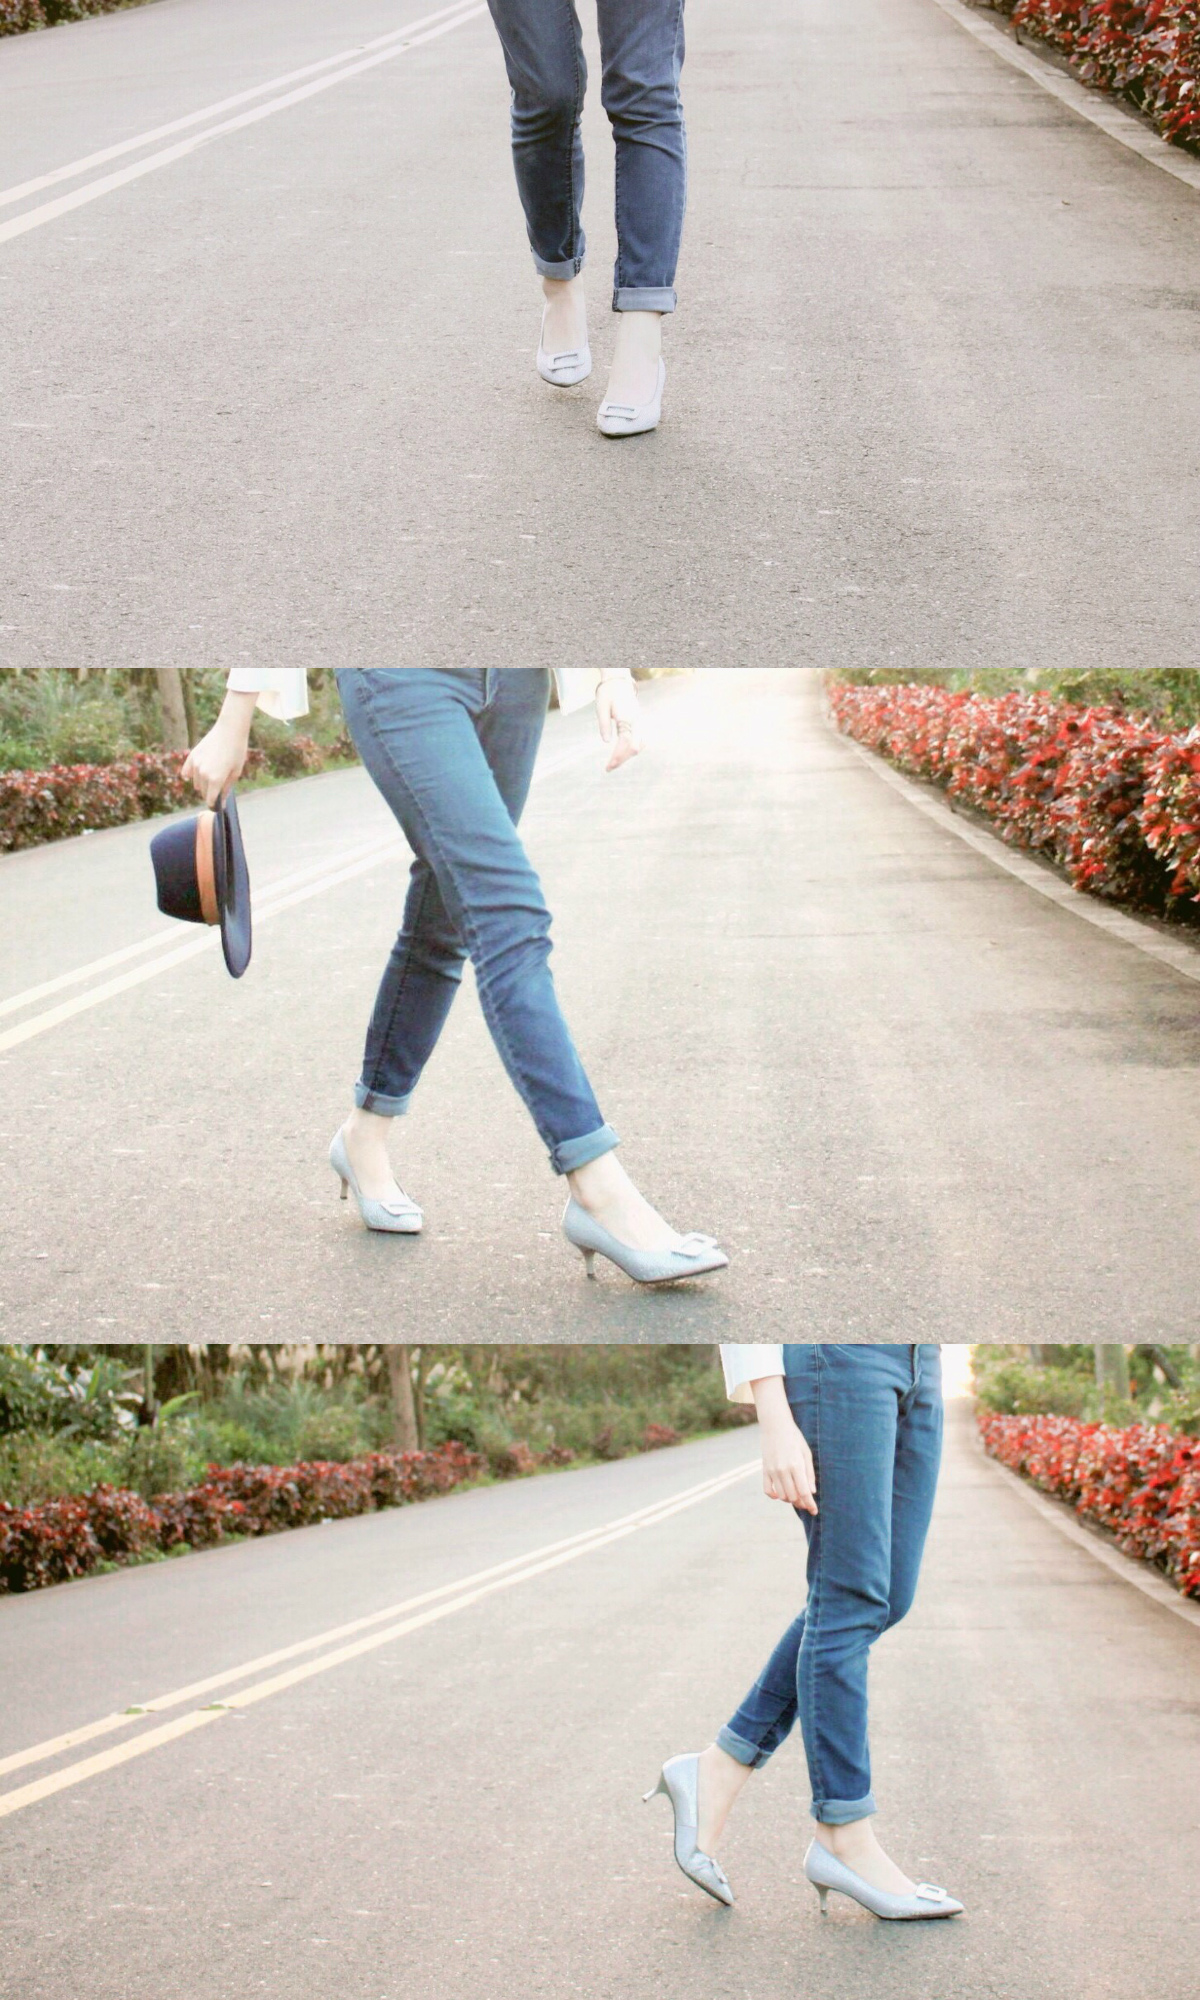 Epris艾佩絲婚宴女鞋 (7).jpg